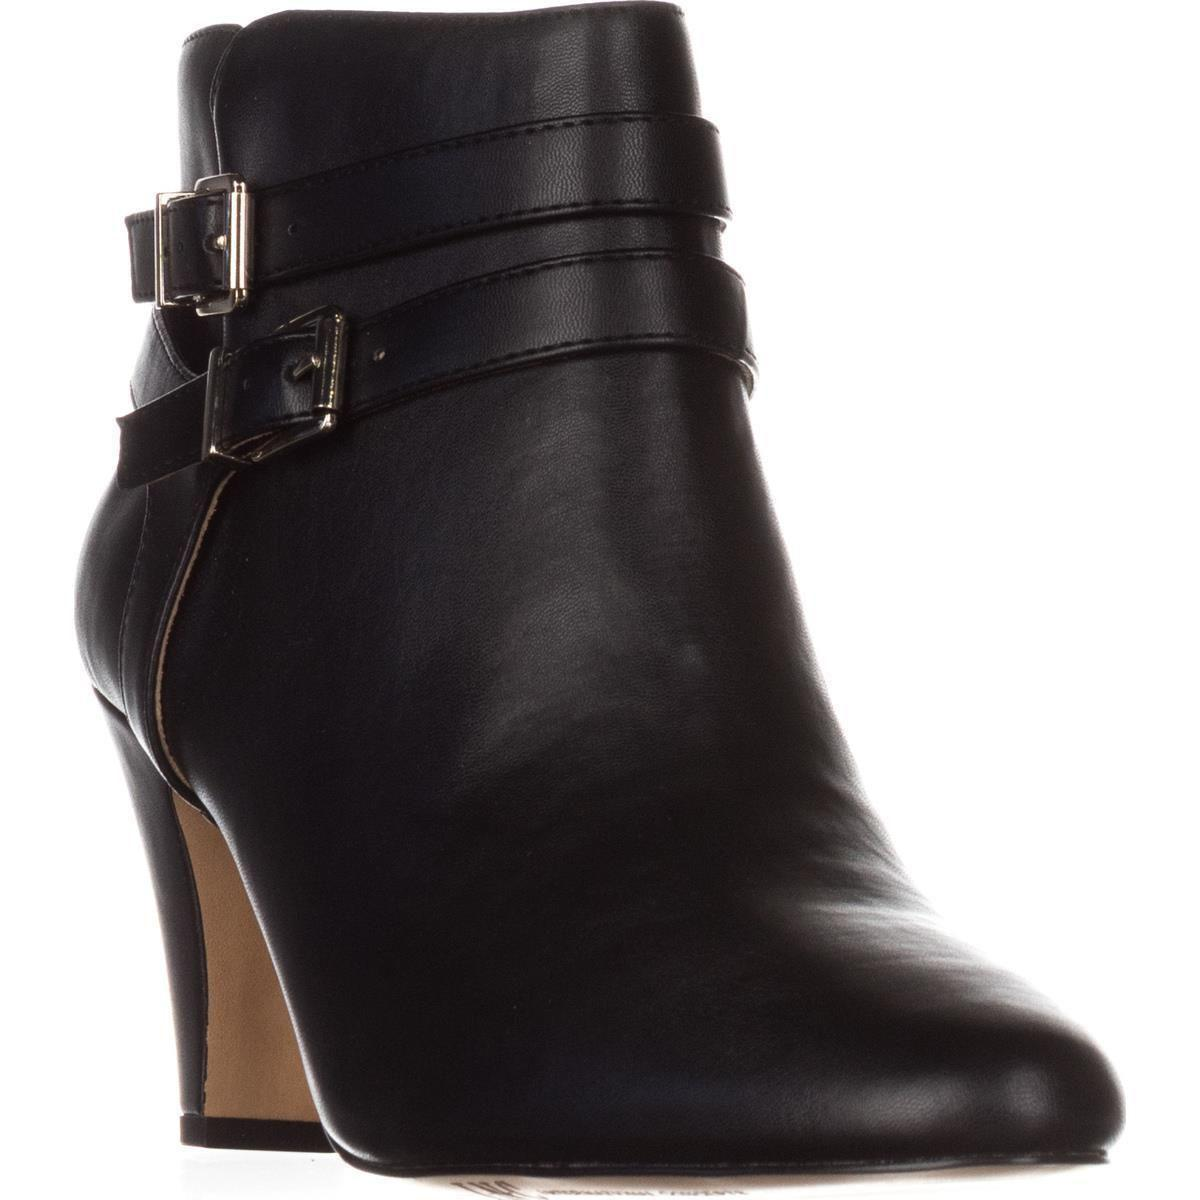 INC International Concepts Herbii Women/'s Boots Black